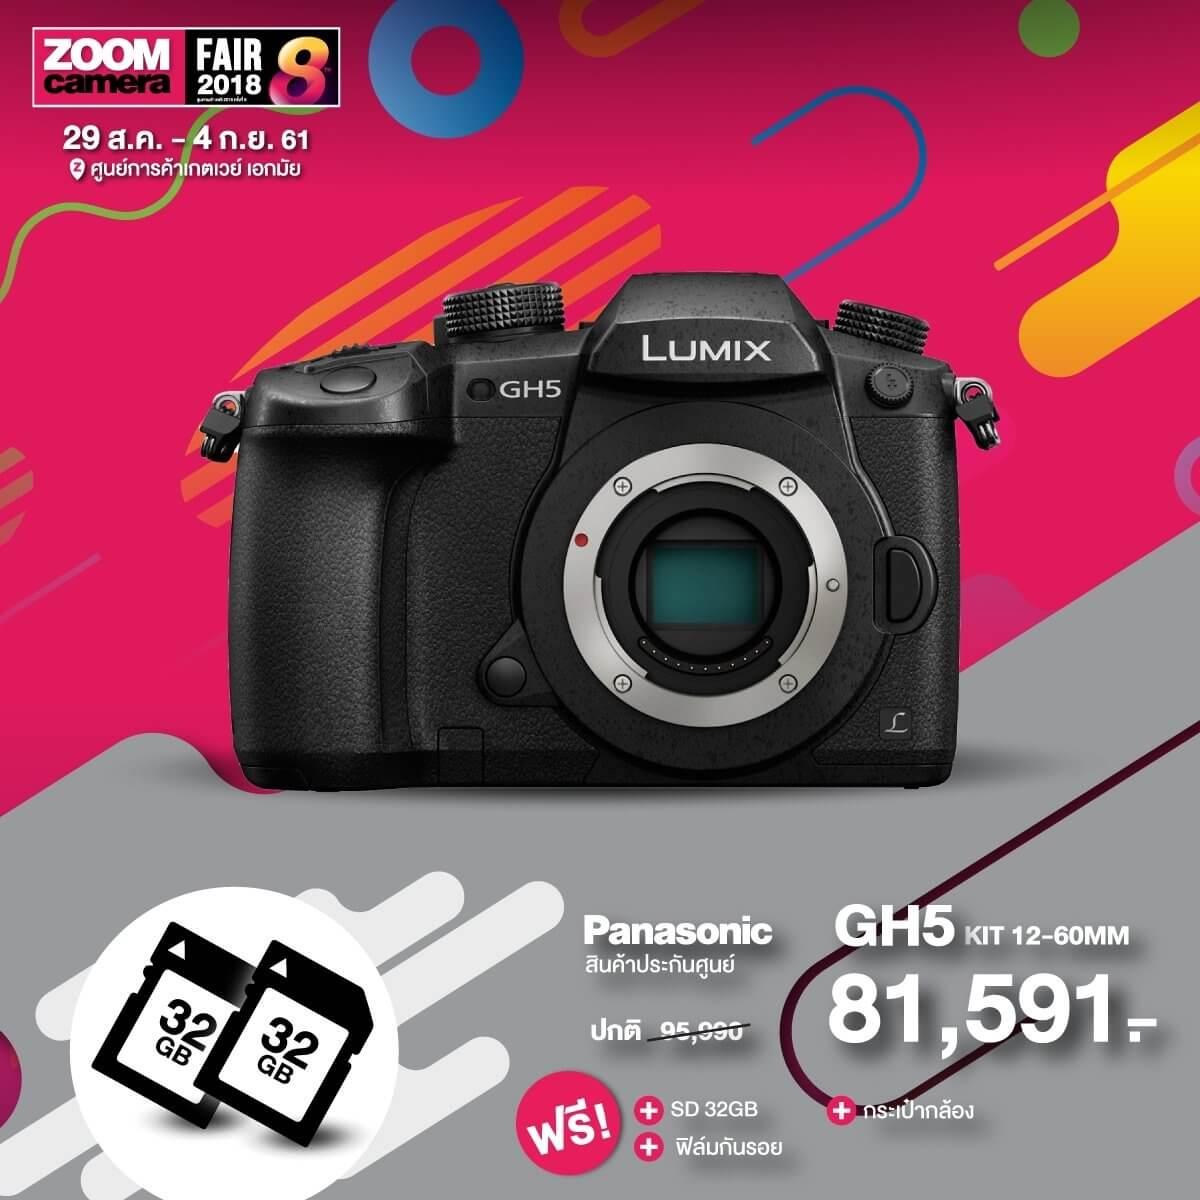 panasonic lumix gh5 kit1260 promotion